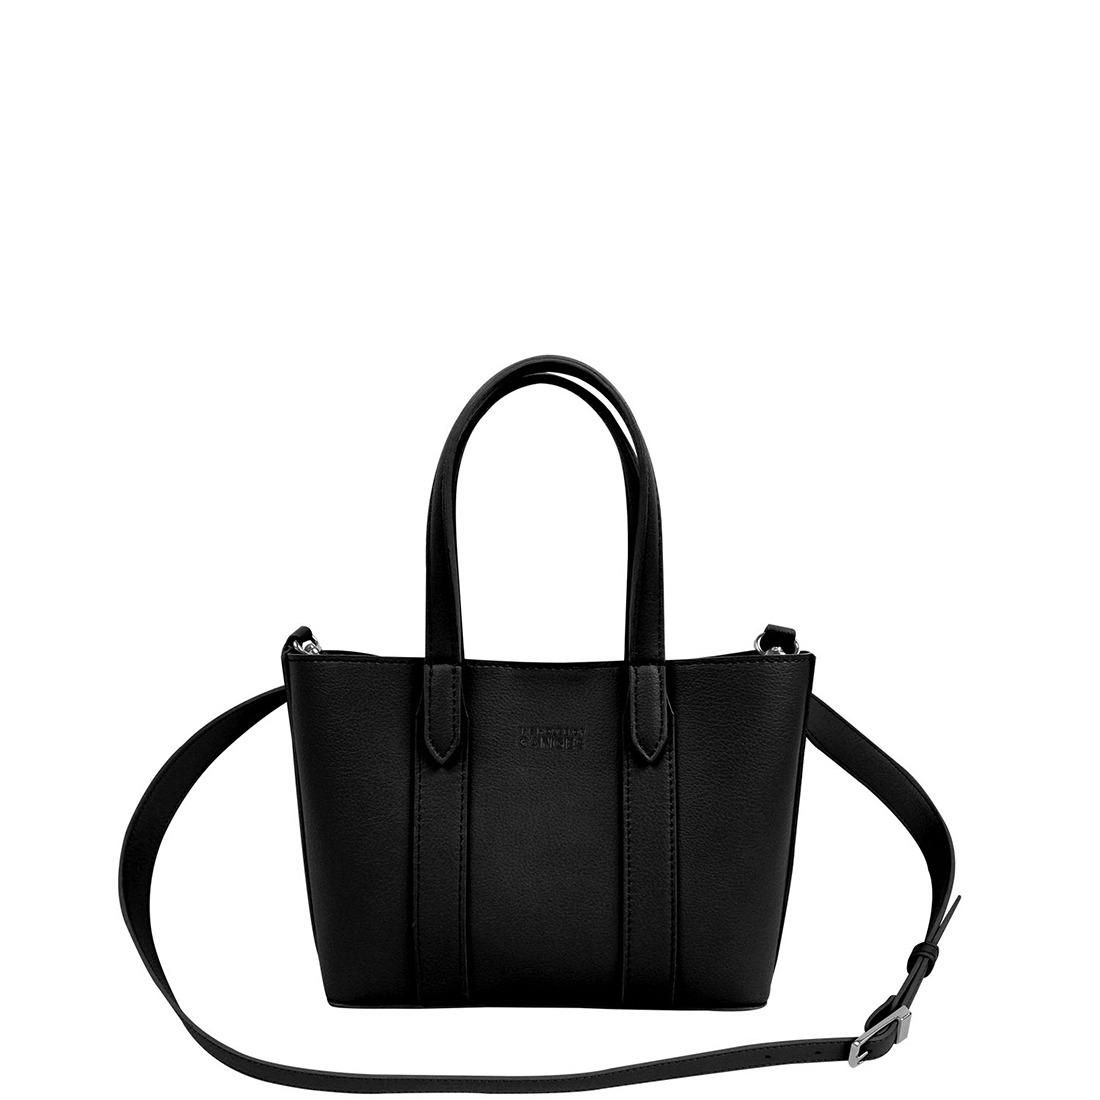 Mini Carryall Black Tote Bag